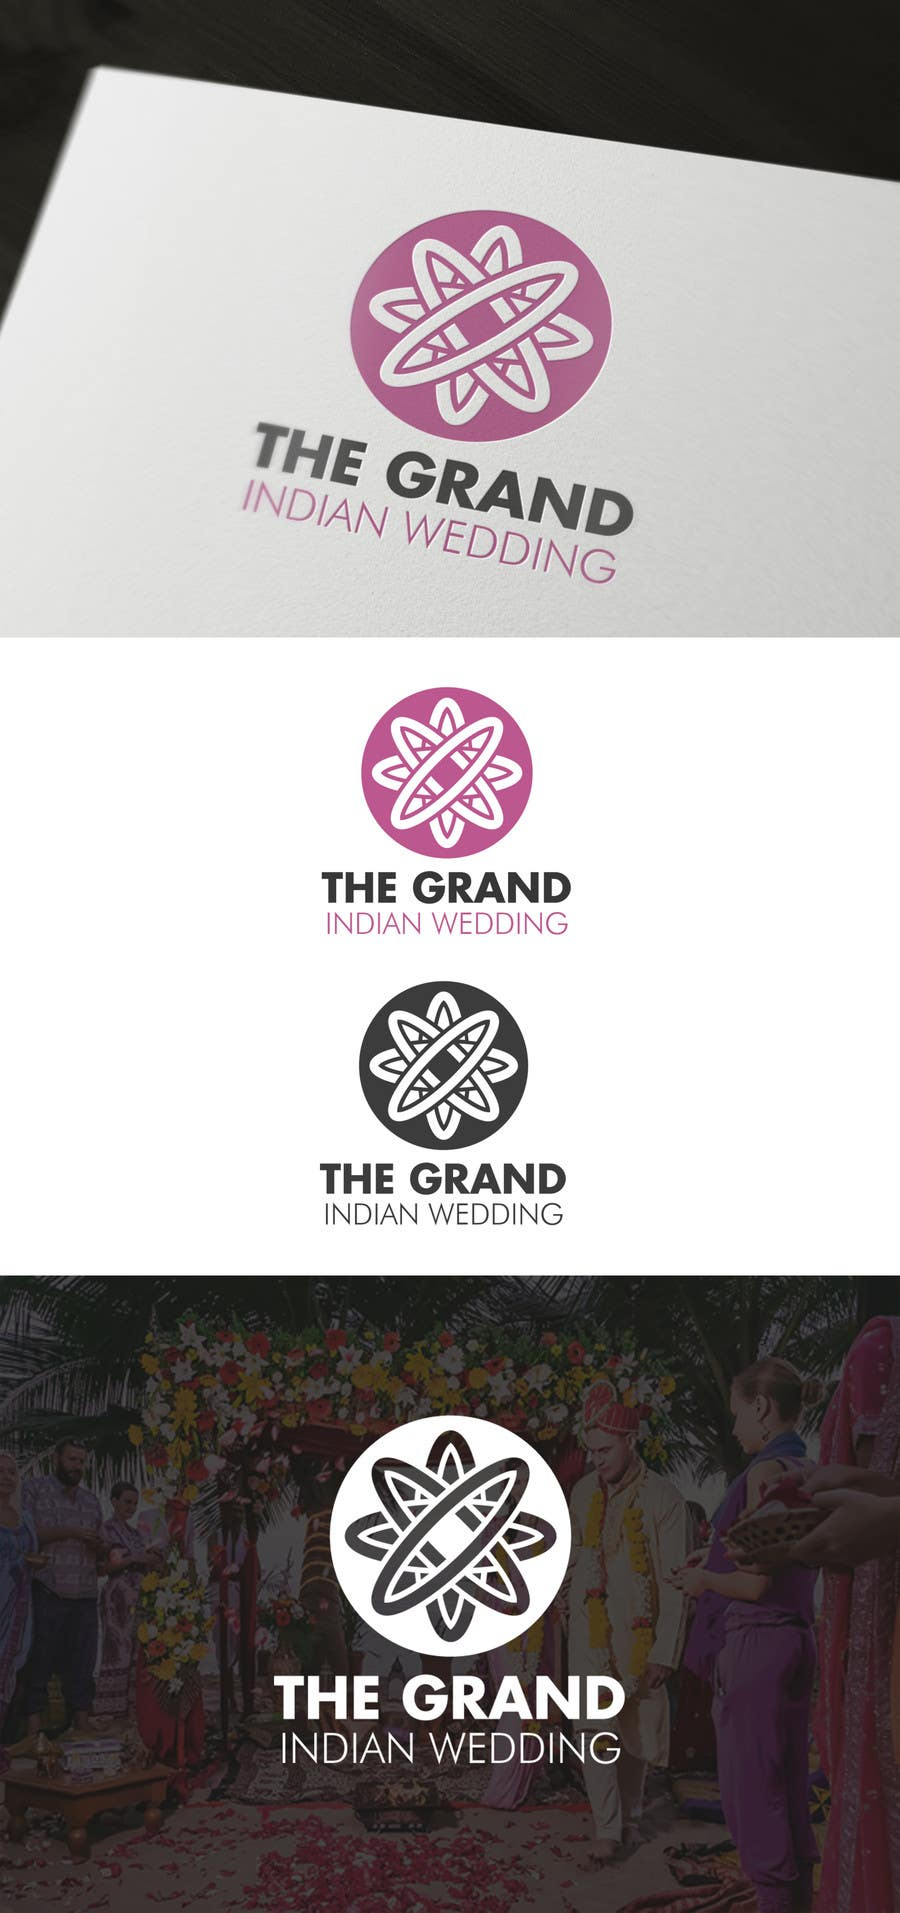 Konkurrenceindlæg #32 for Design a Logo for a destination wedding planning company